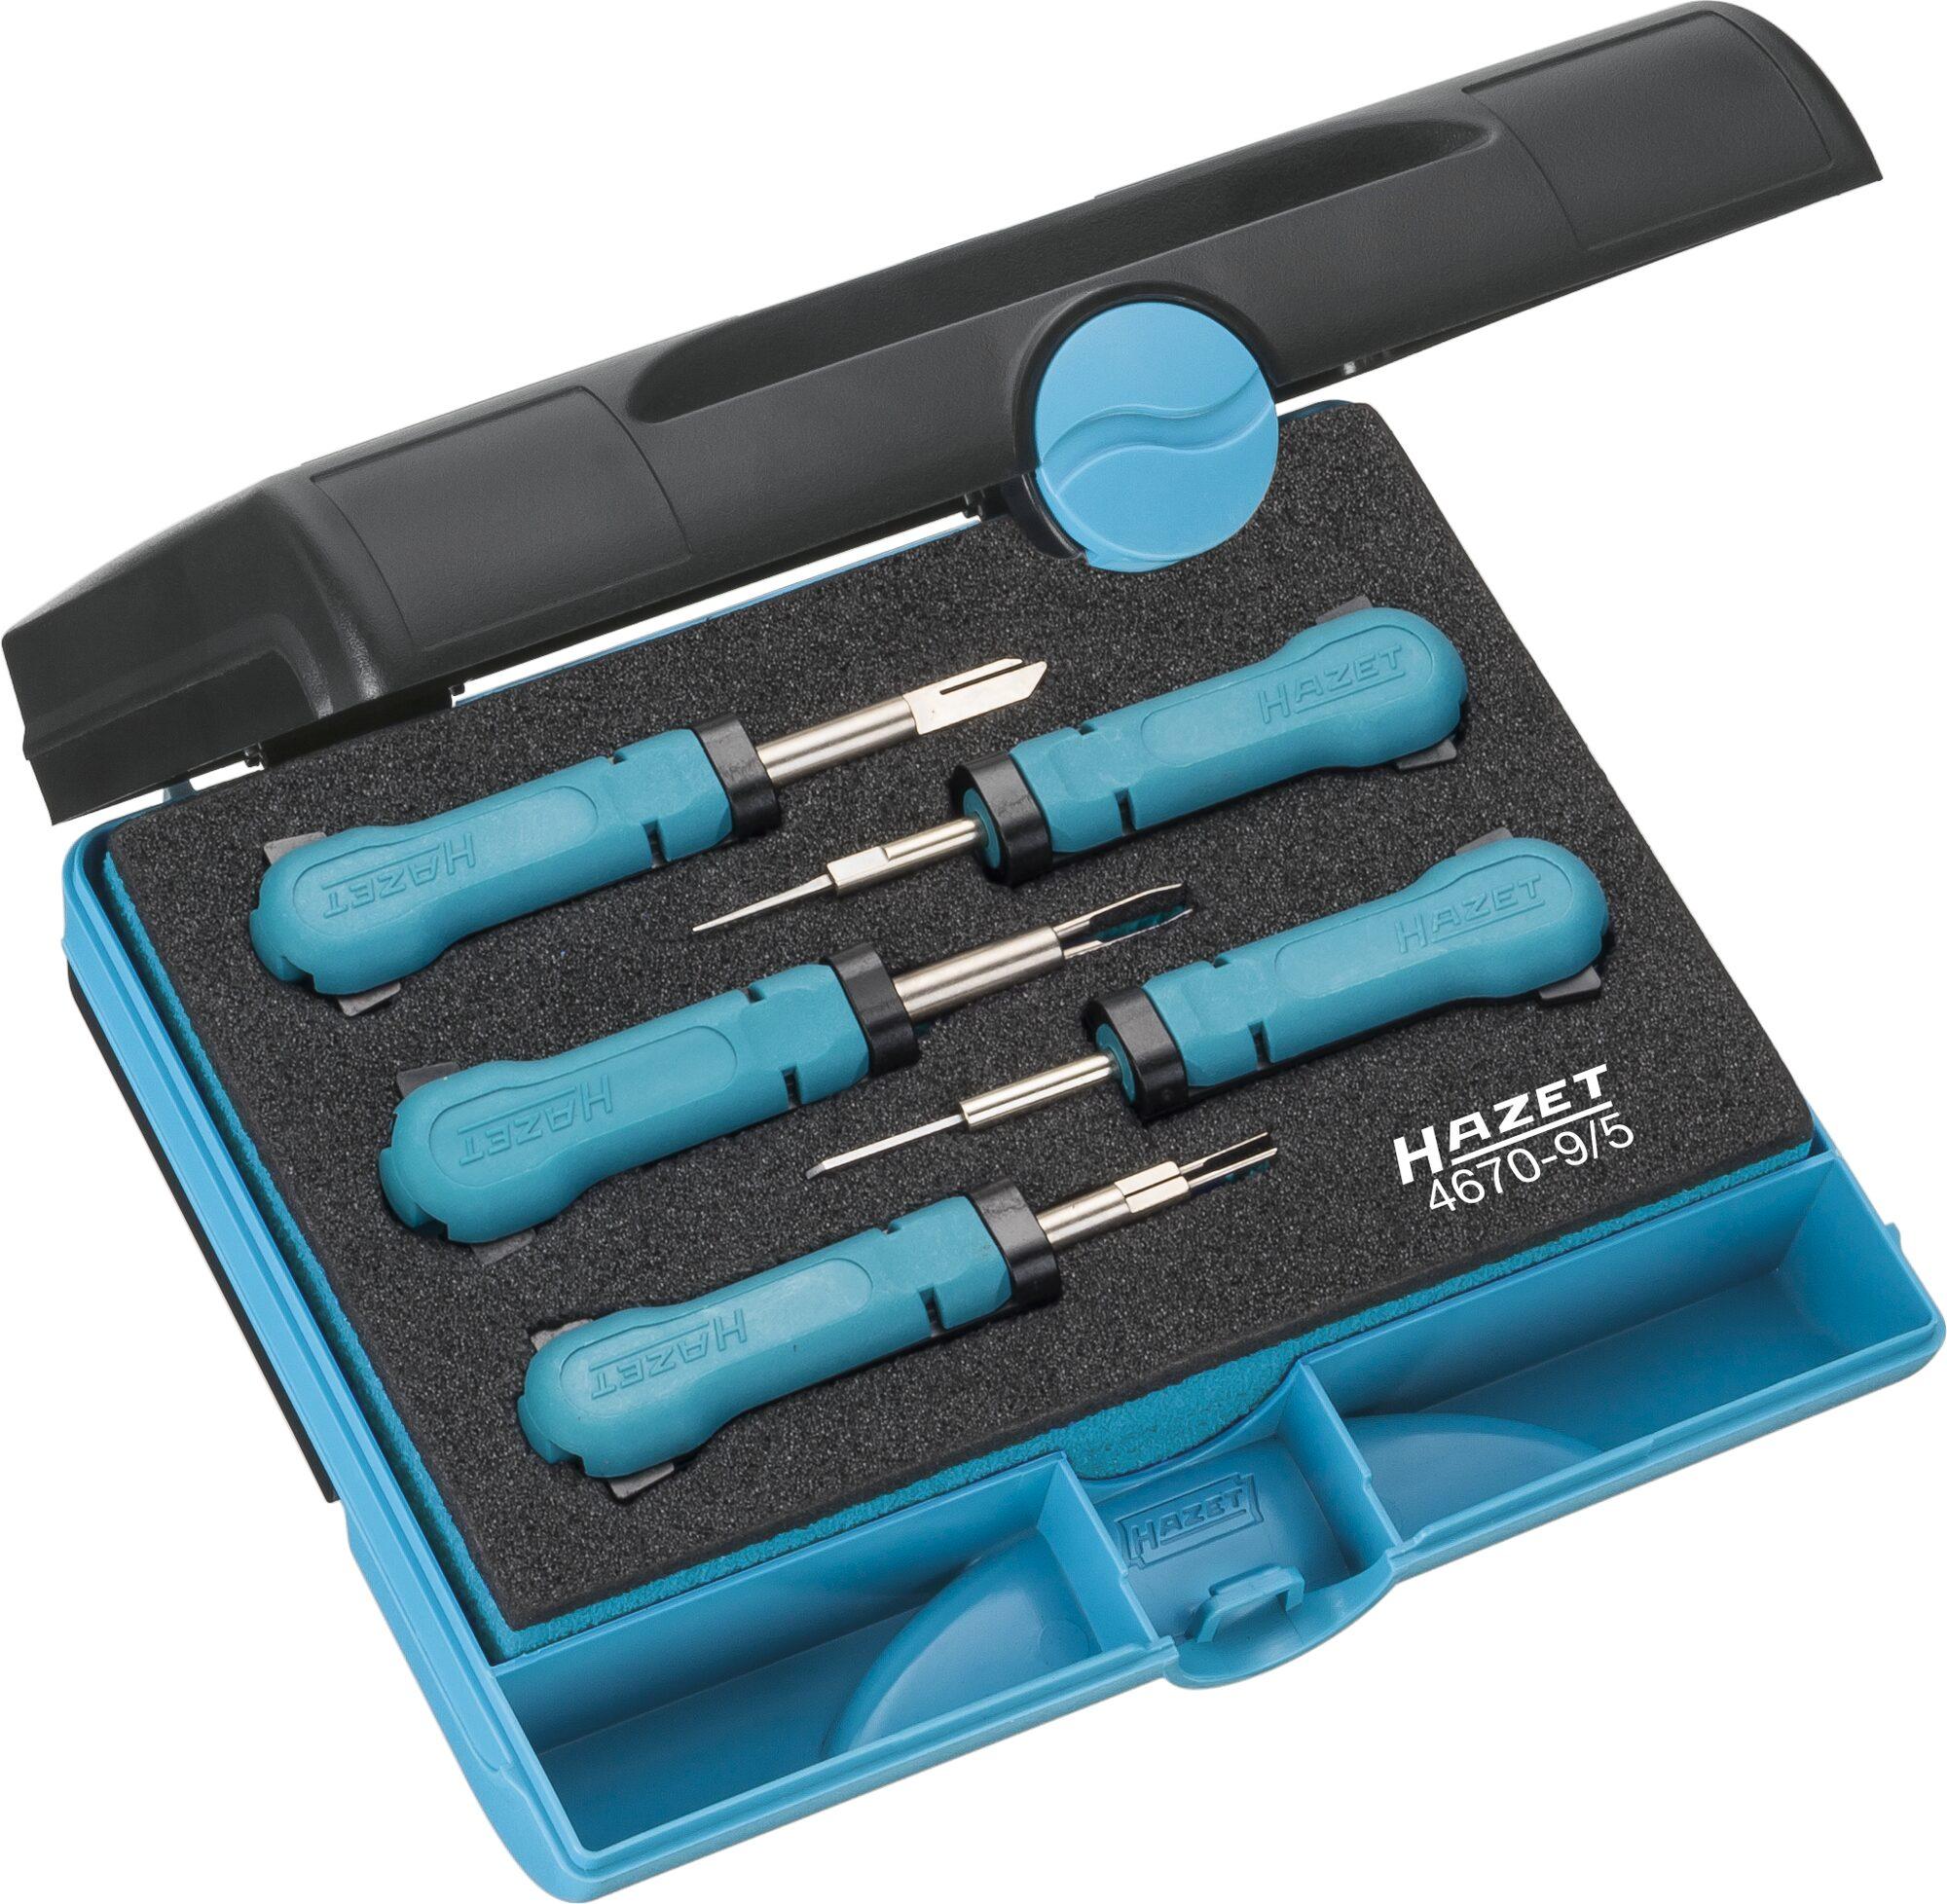 HAZET Kabelentriegeler Sortiment 4670-9/5 ∙ Anzahl Werkzeuge: 5